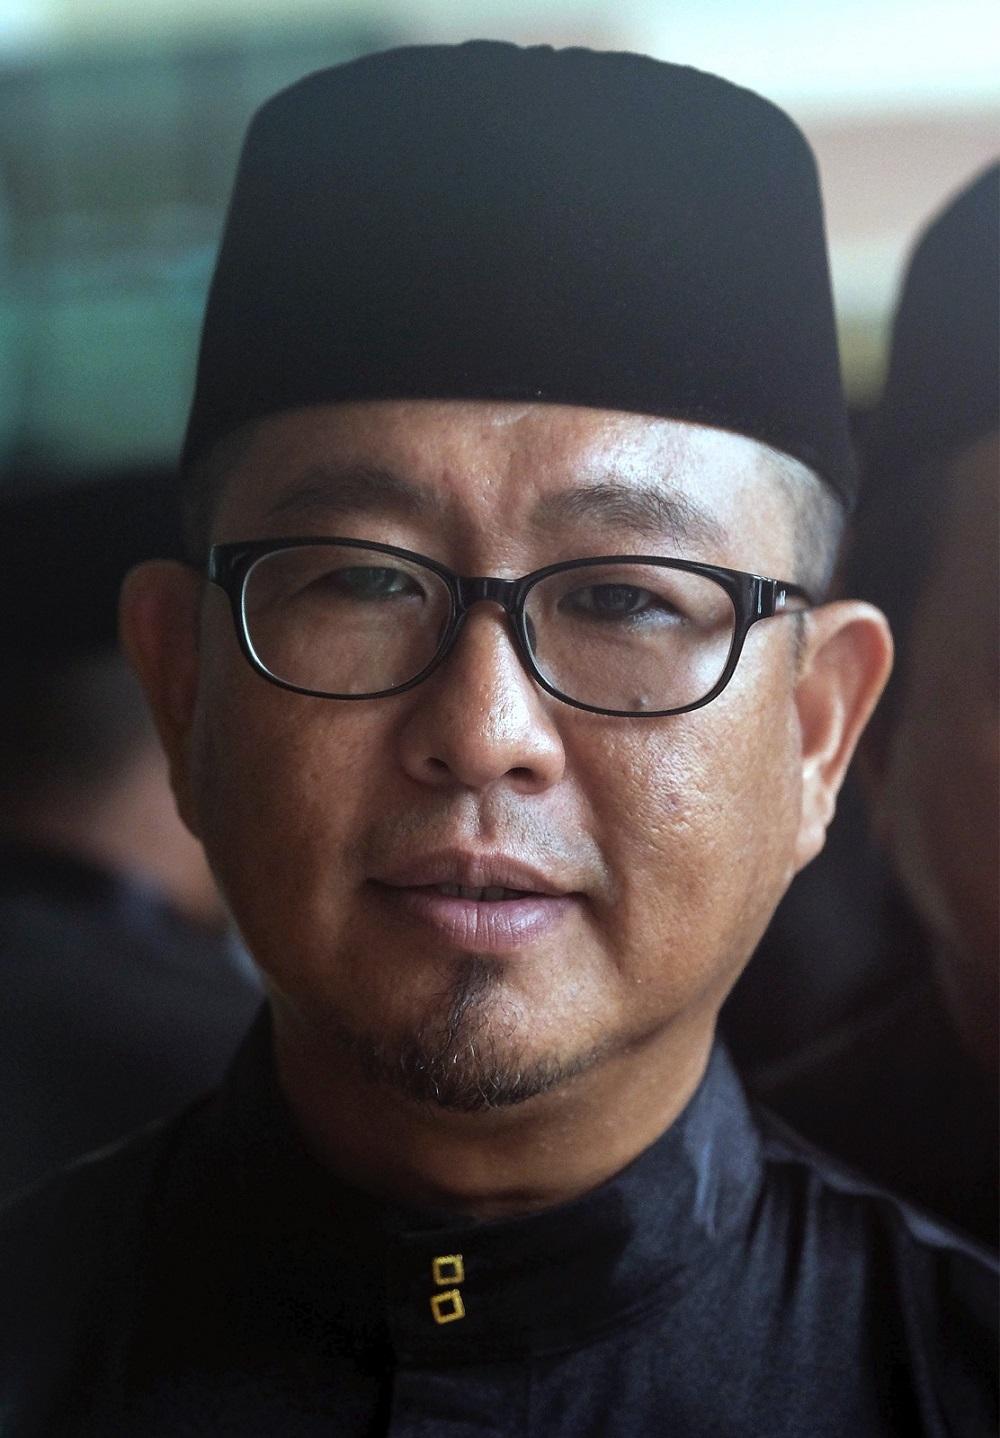 Ex-PKR, independent assemblyman for Rembia joins Umno